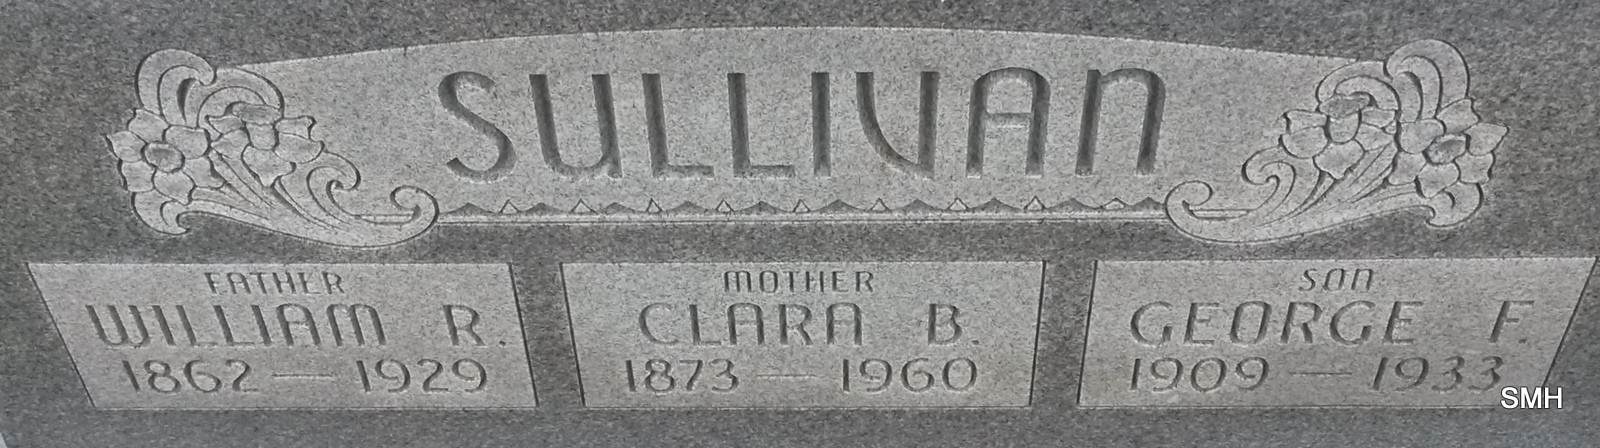 George F. Sullivan